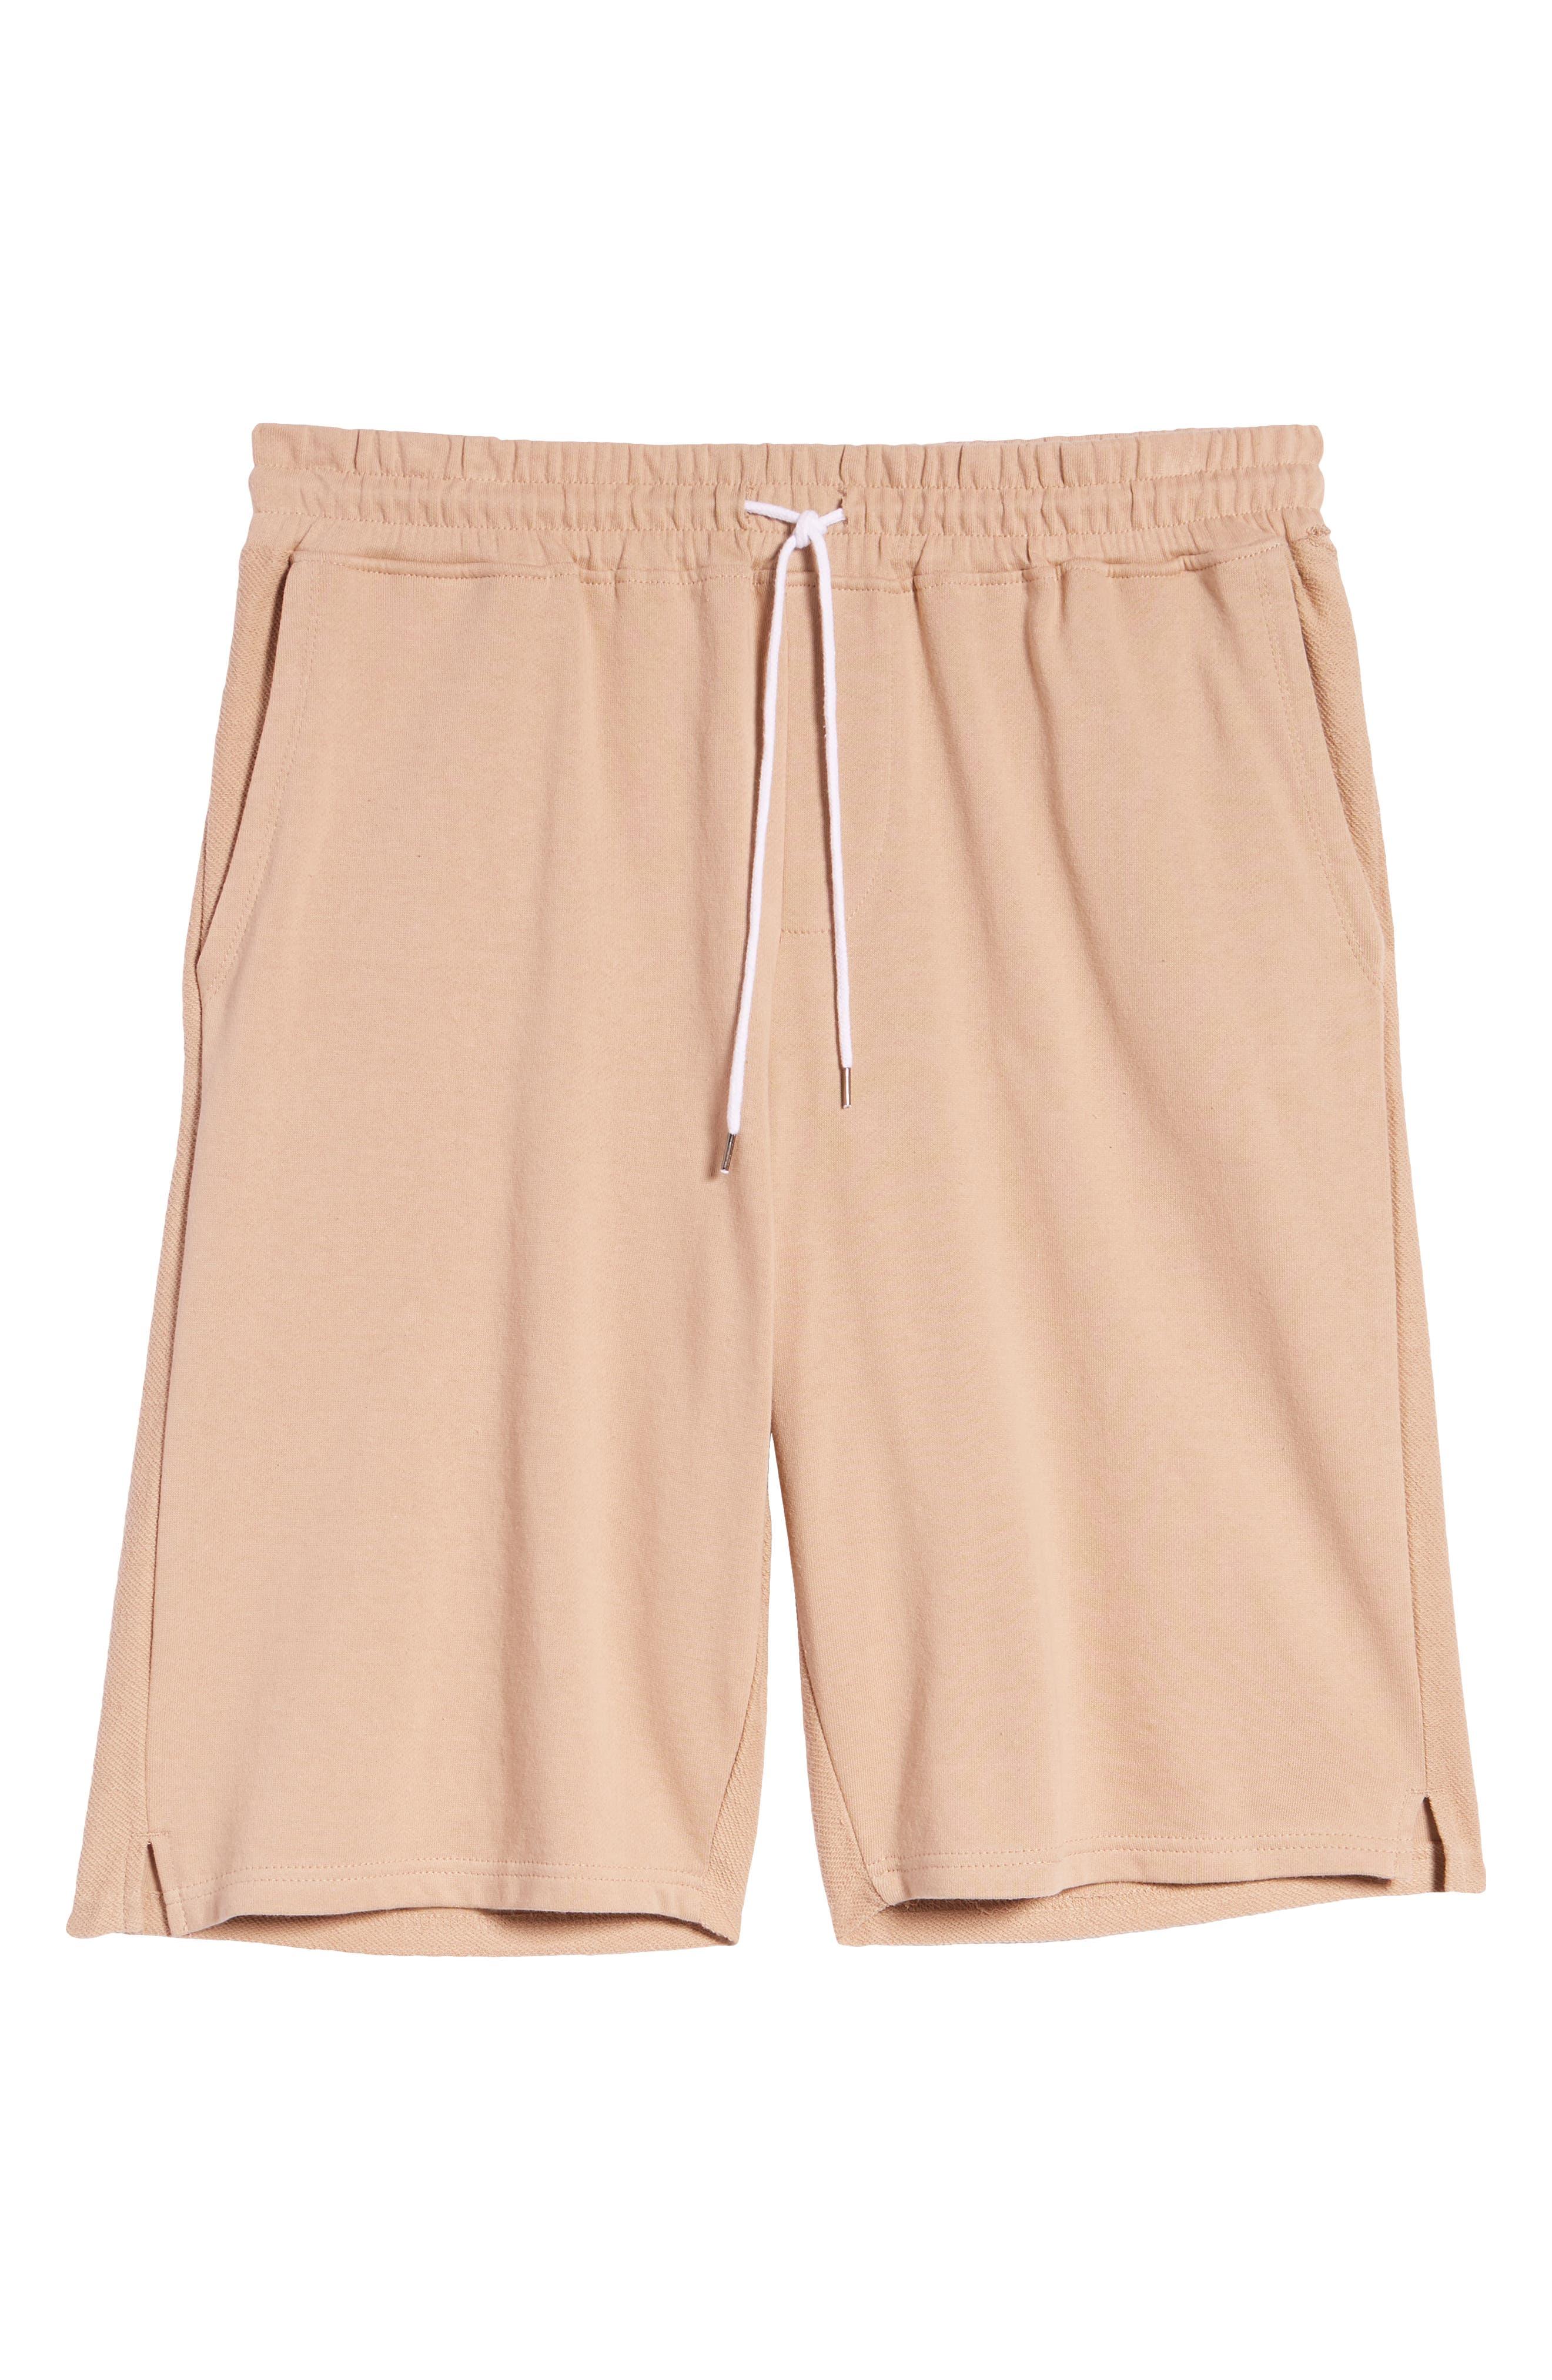 Terry Drawstring Shorts,                             Alternate thumbnail 5, color,                             Tan Safari